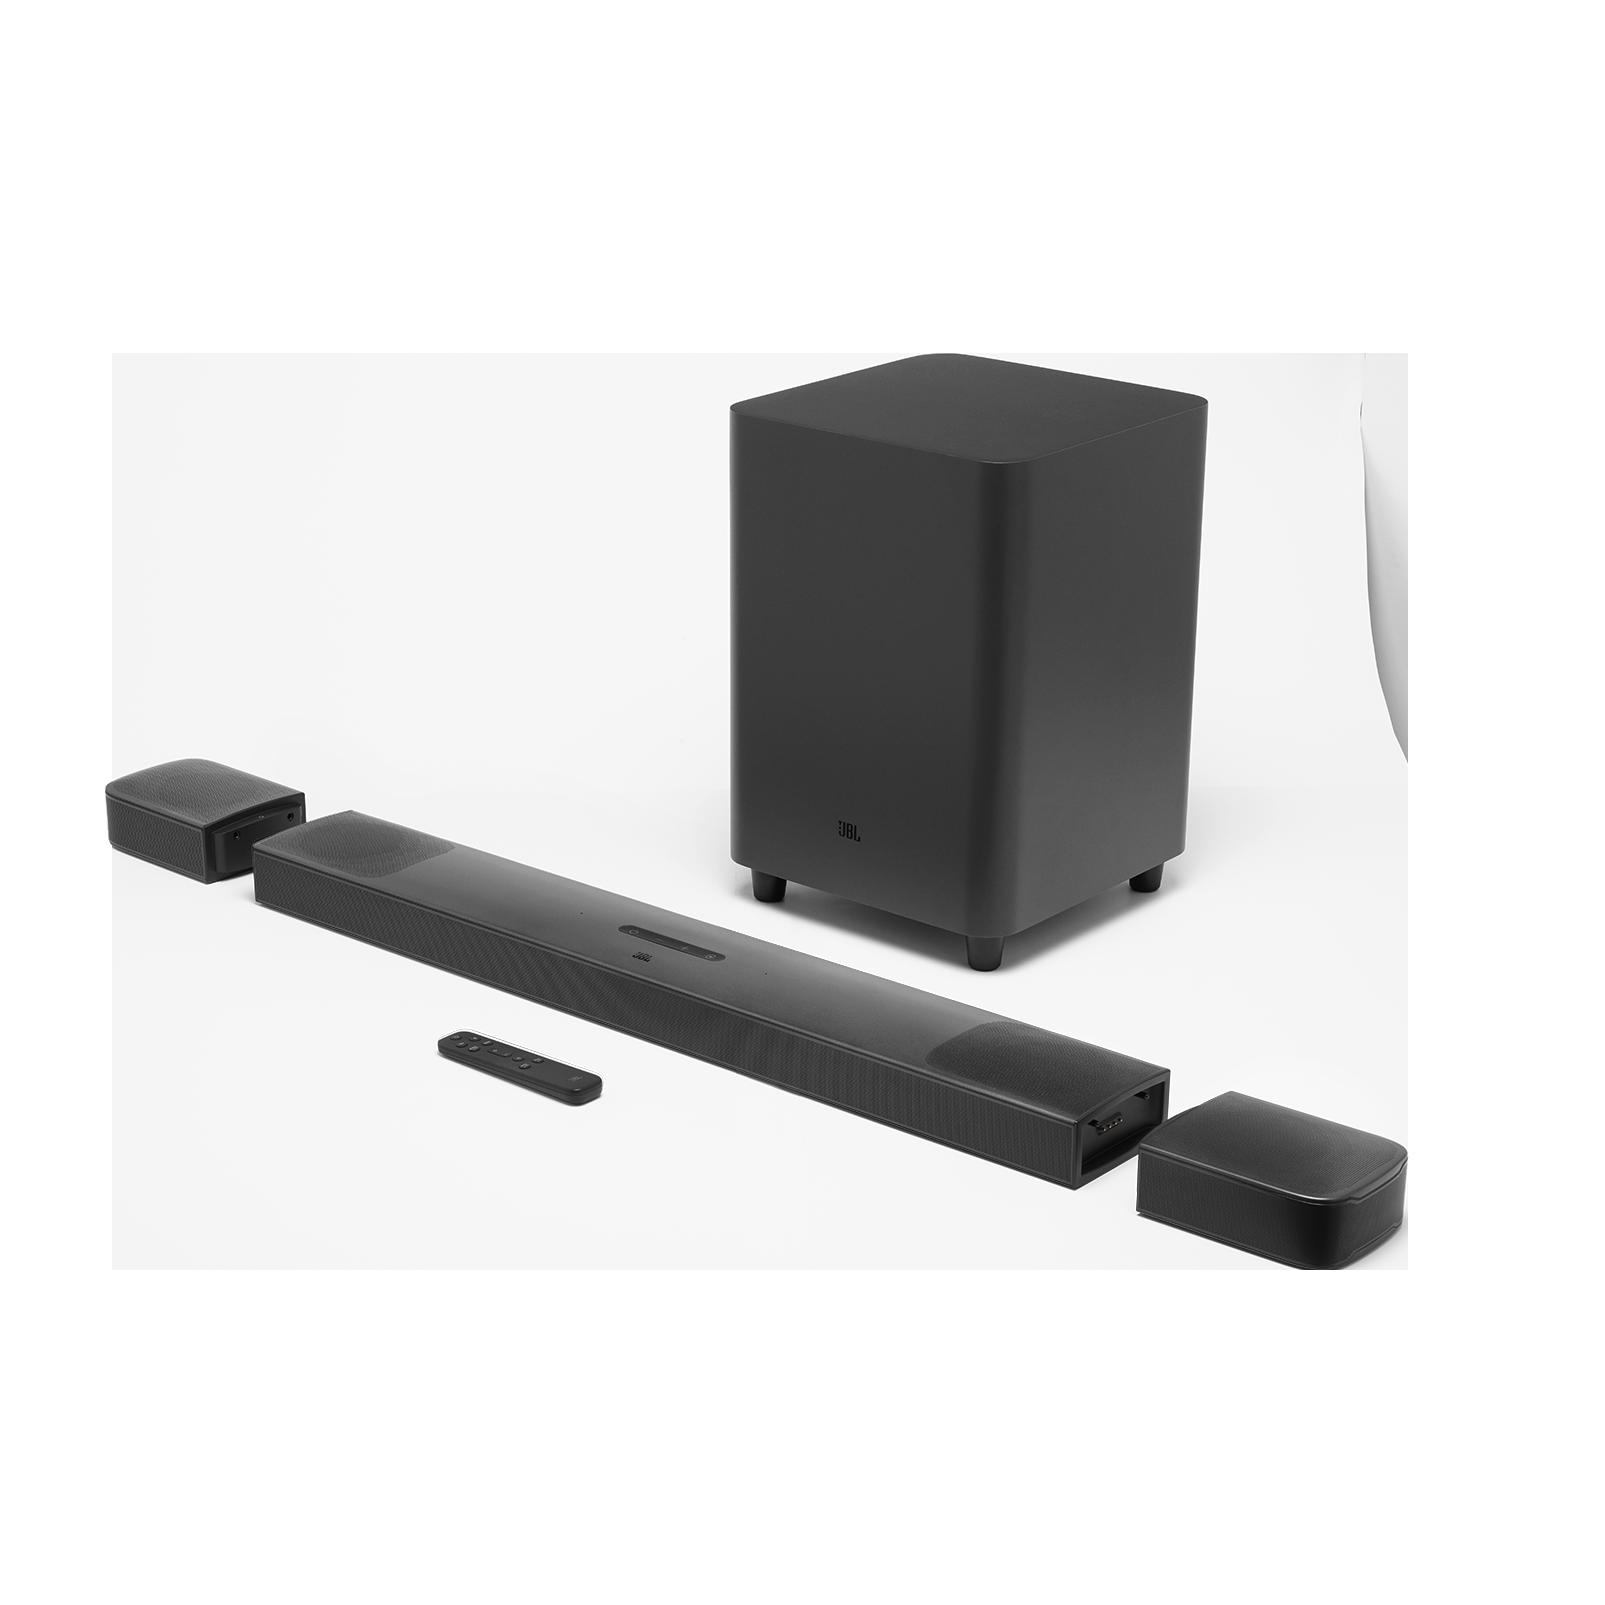 JBL BAR 9.1 True Wireless Surround with Dolby Atmos® - Black - Hero